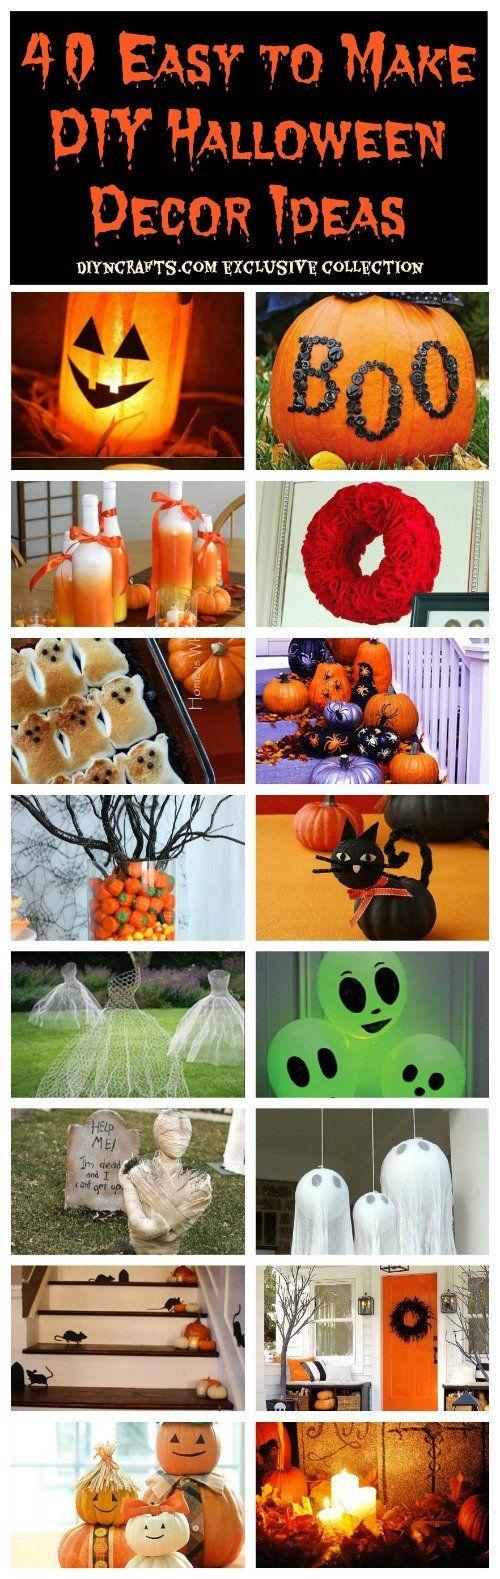 40 Easy to Make DIY Halloween Decor and Organizing Ideas